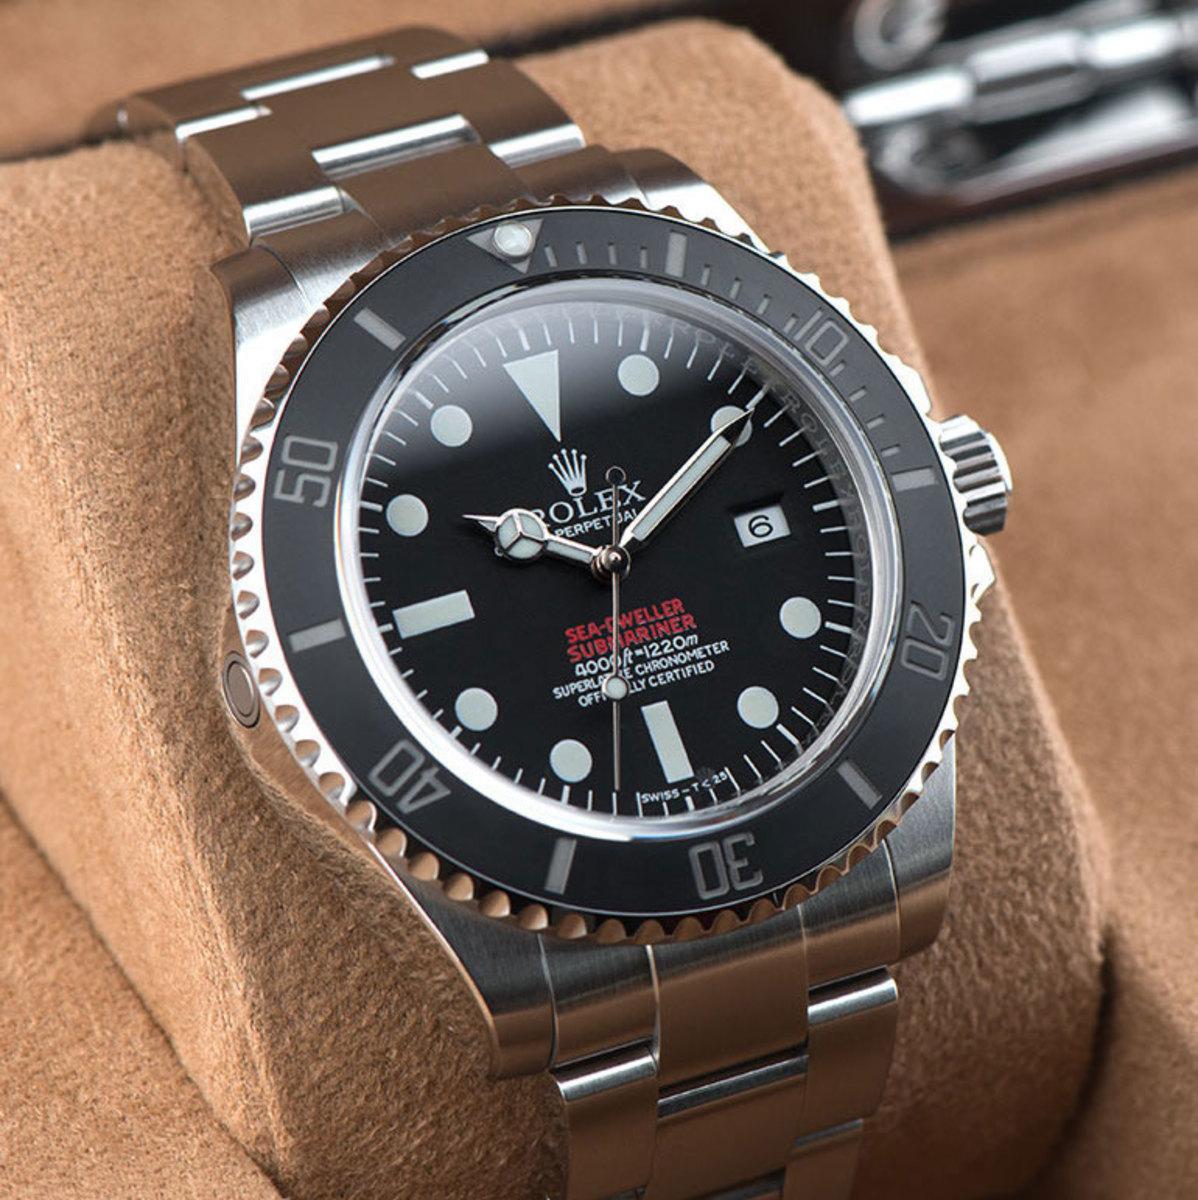 Blaken Rolex Sea-Dweller